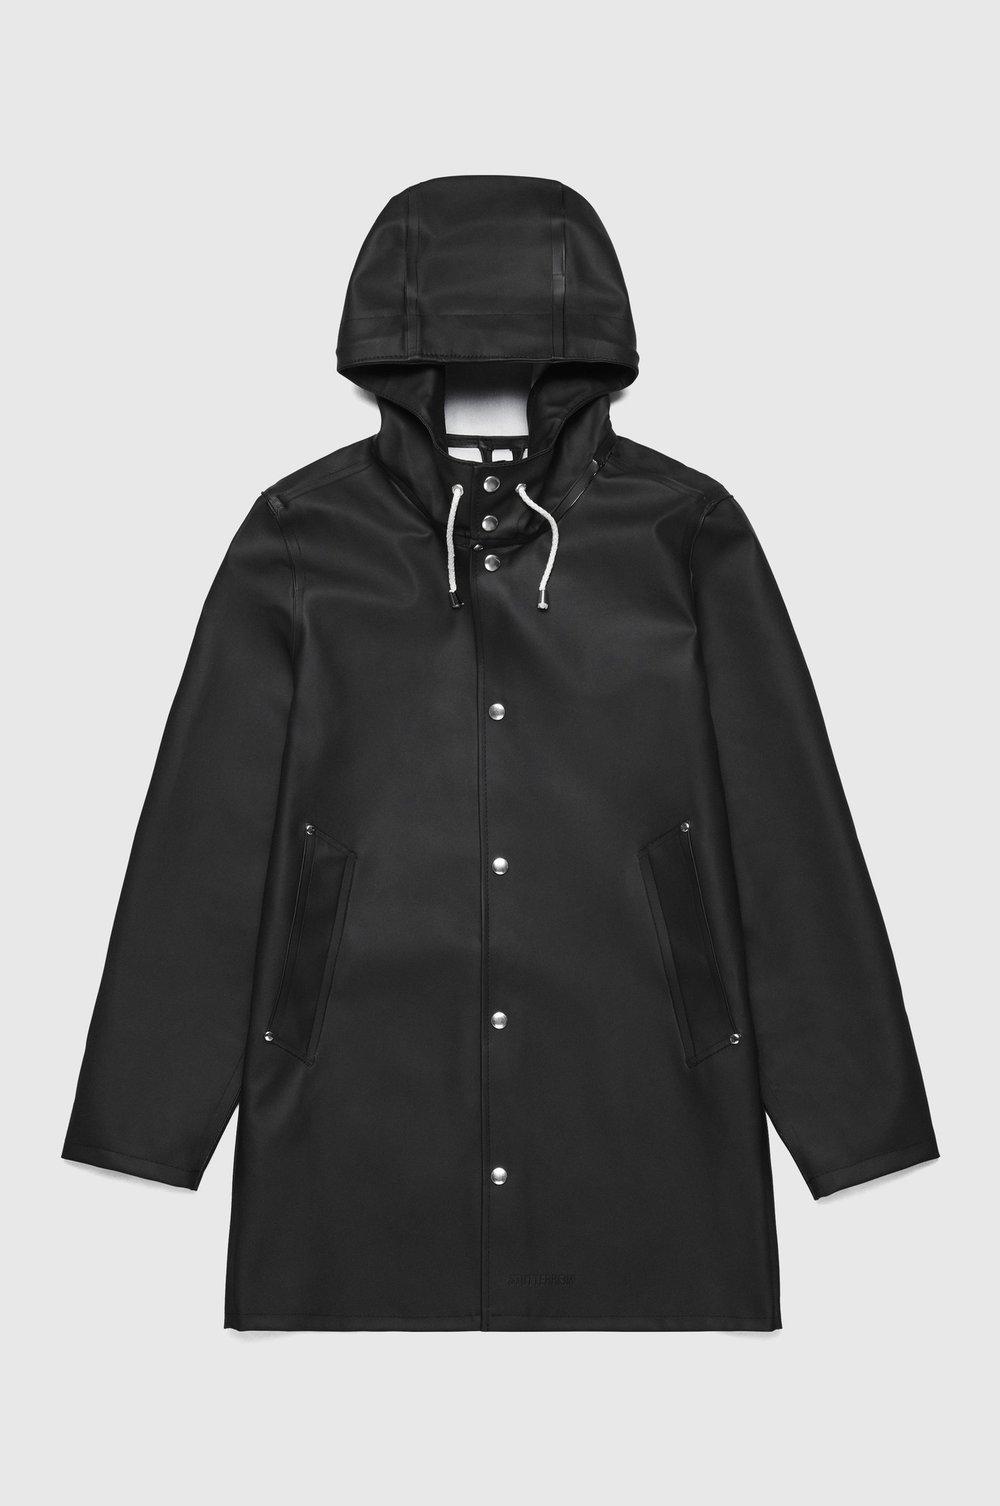 stutterheim_raincoat_noos_unisex_stockholm_black_1.jpg